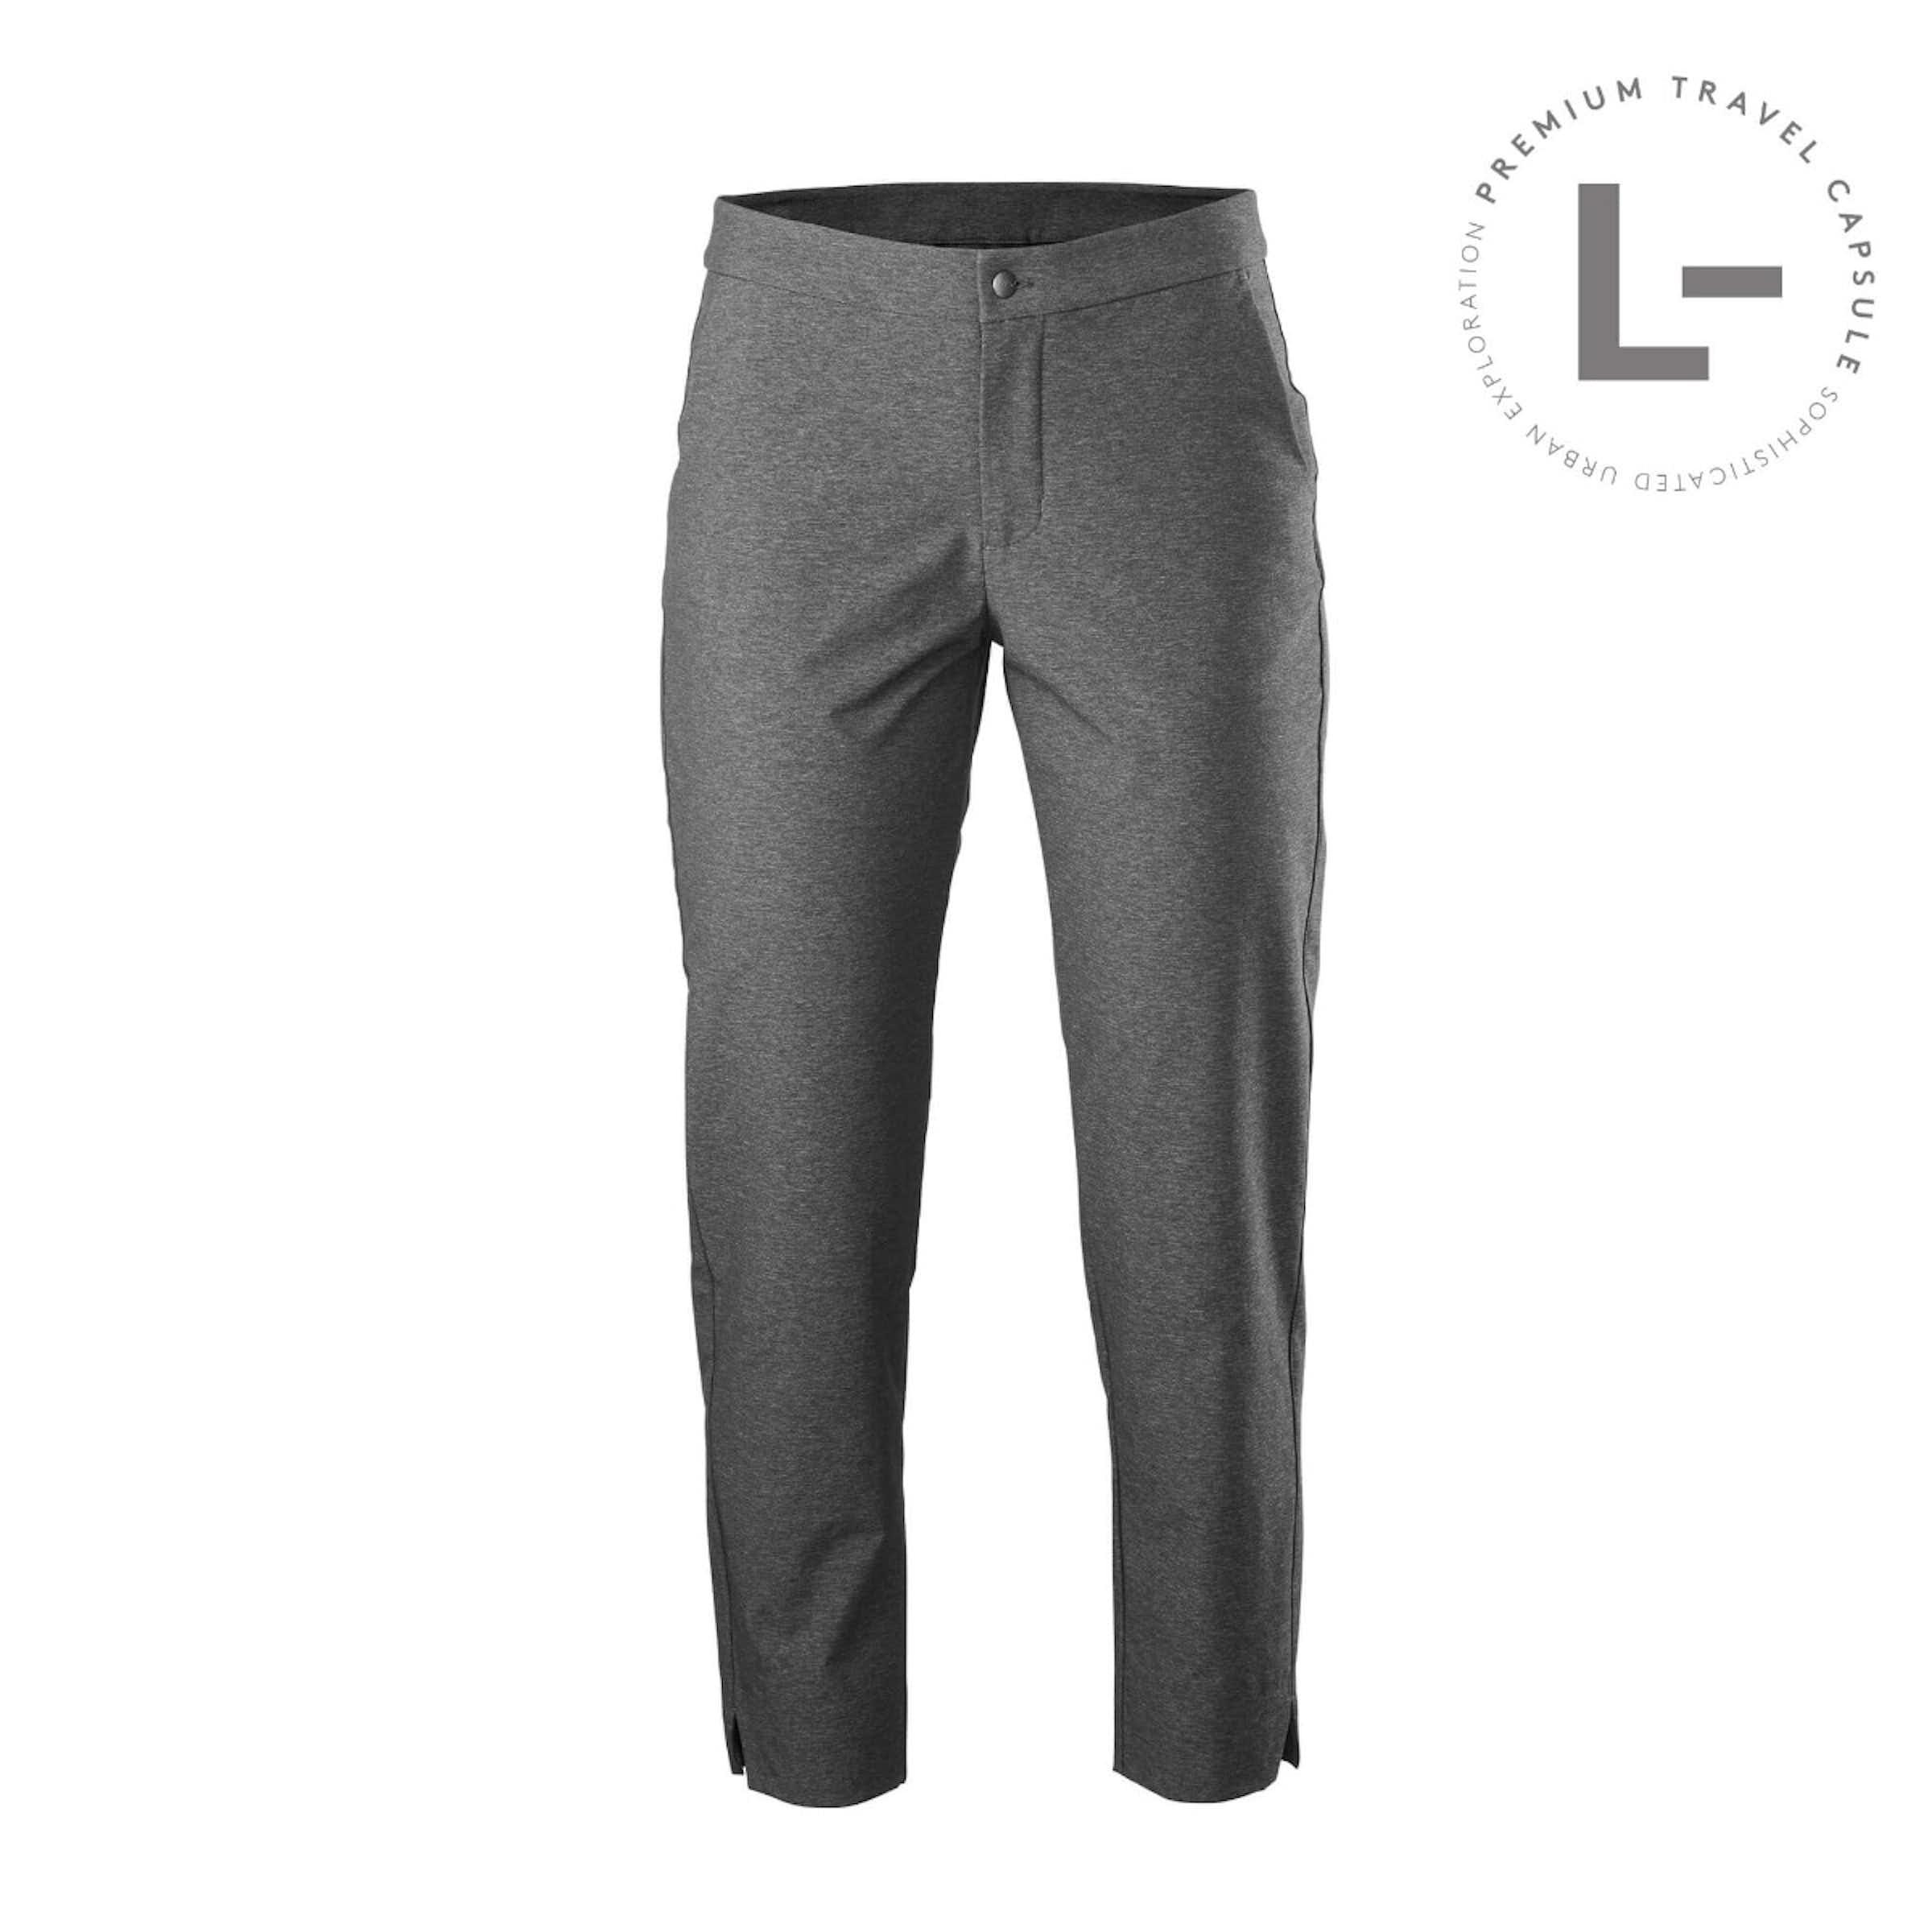 1e05b1c3c9 Womens Hiking Pants & Shorts | Travel Pants for Women | AU